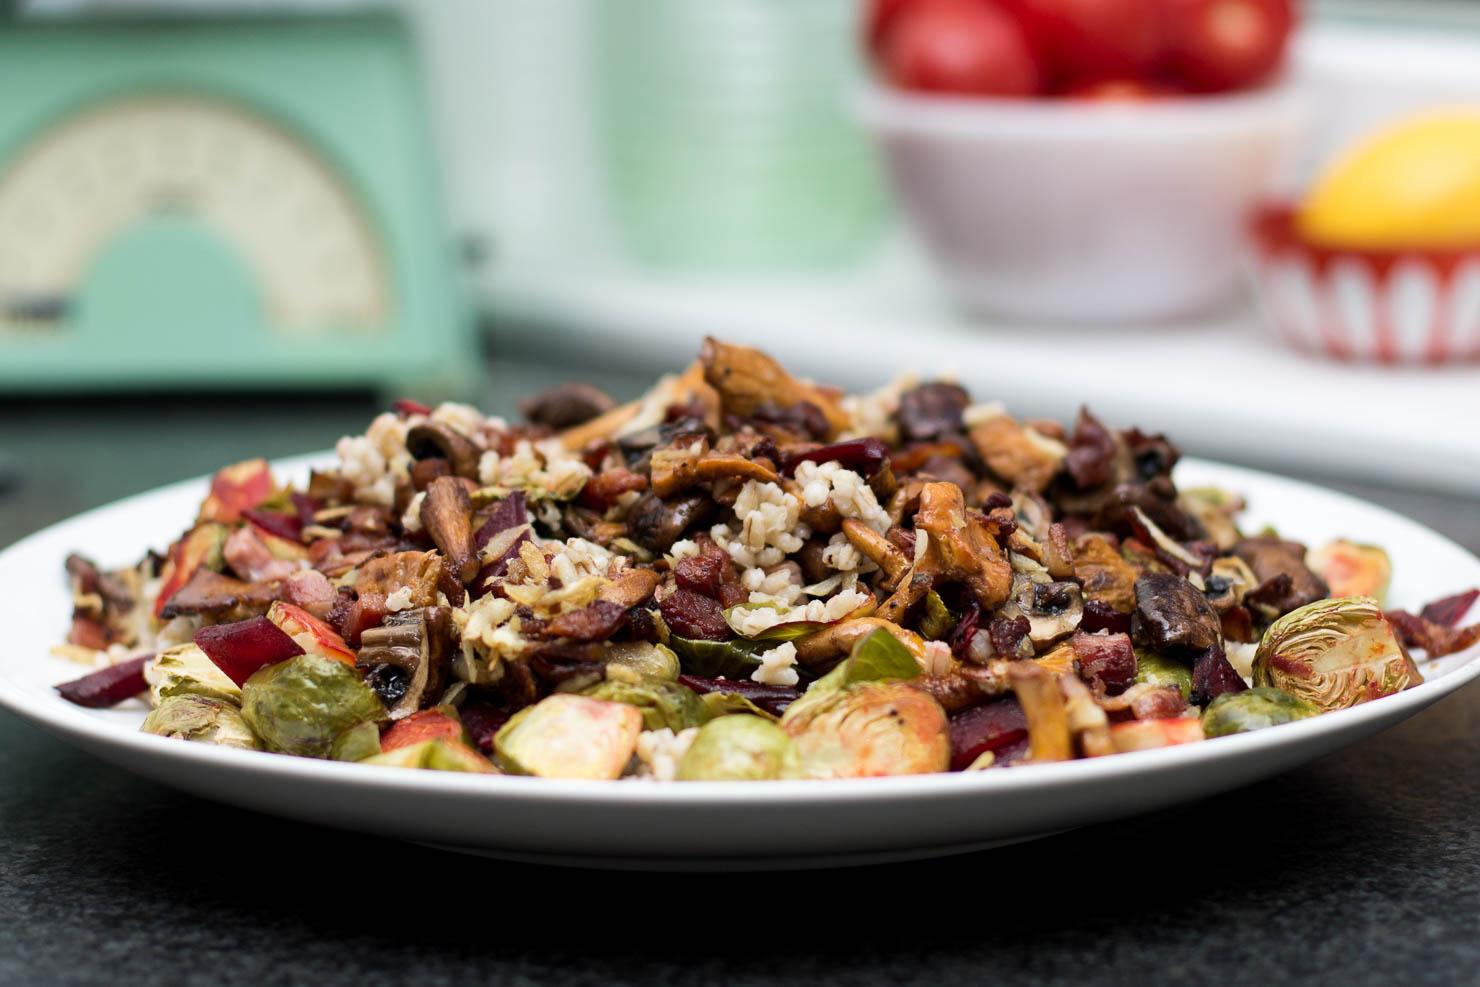 Featured   Høstens byggrynsalat med rosenkål, rødbeter og bacon